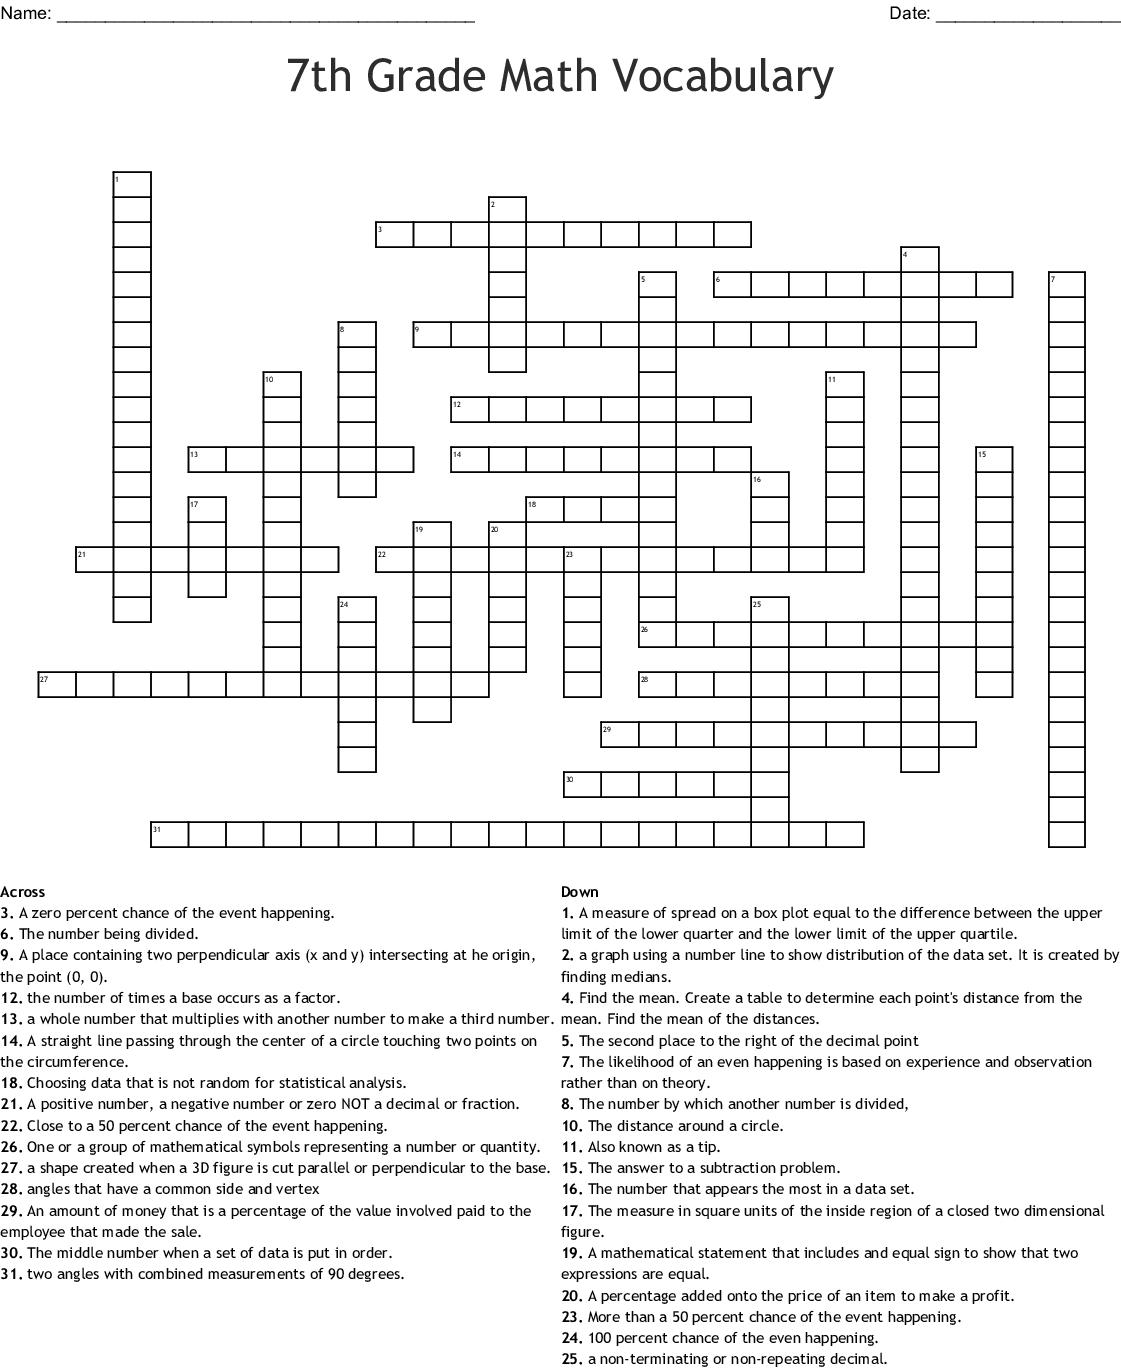 Crossword Puzzle Math Words